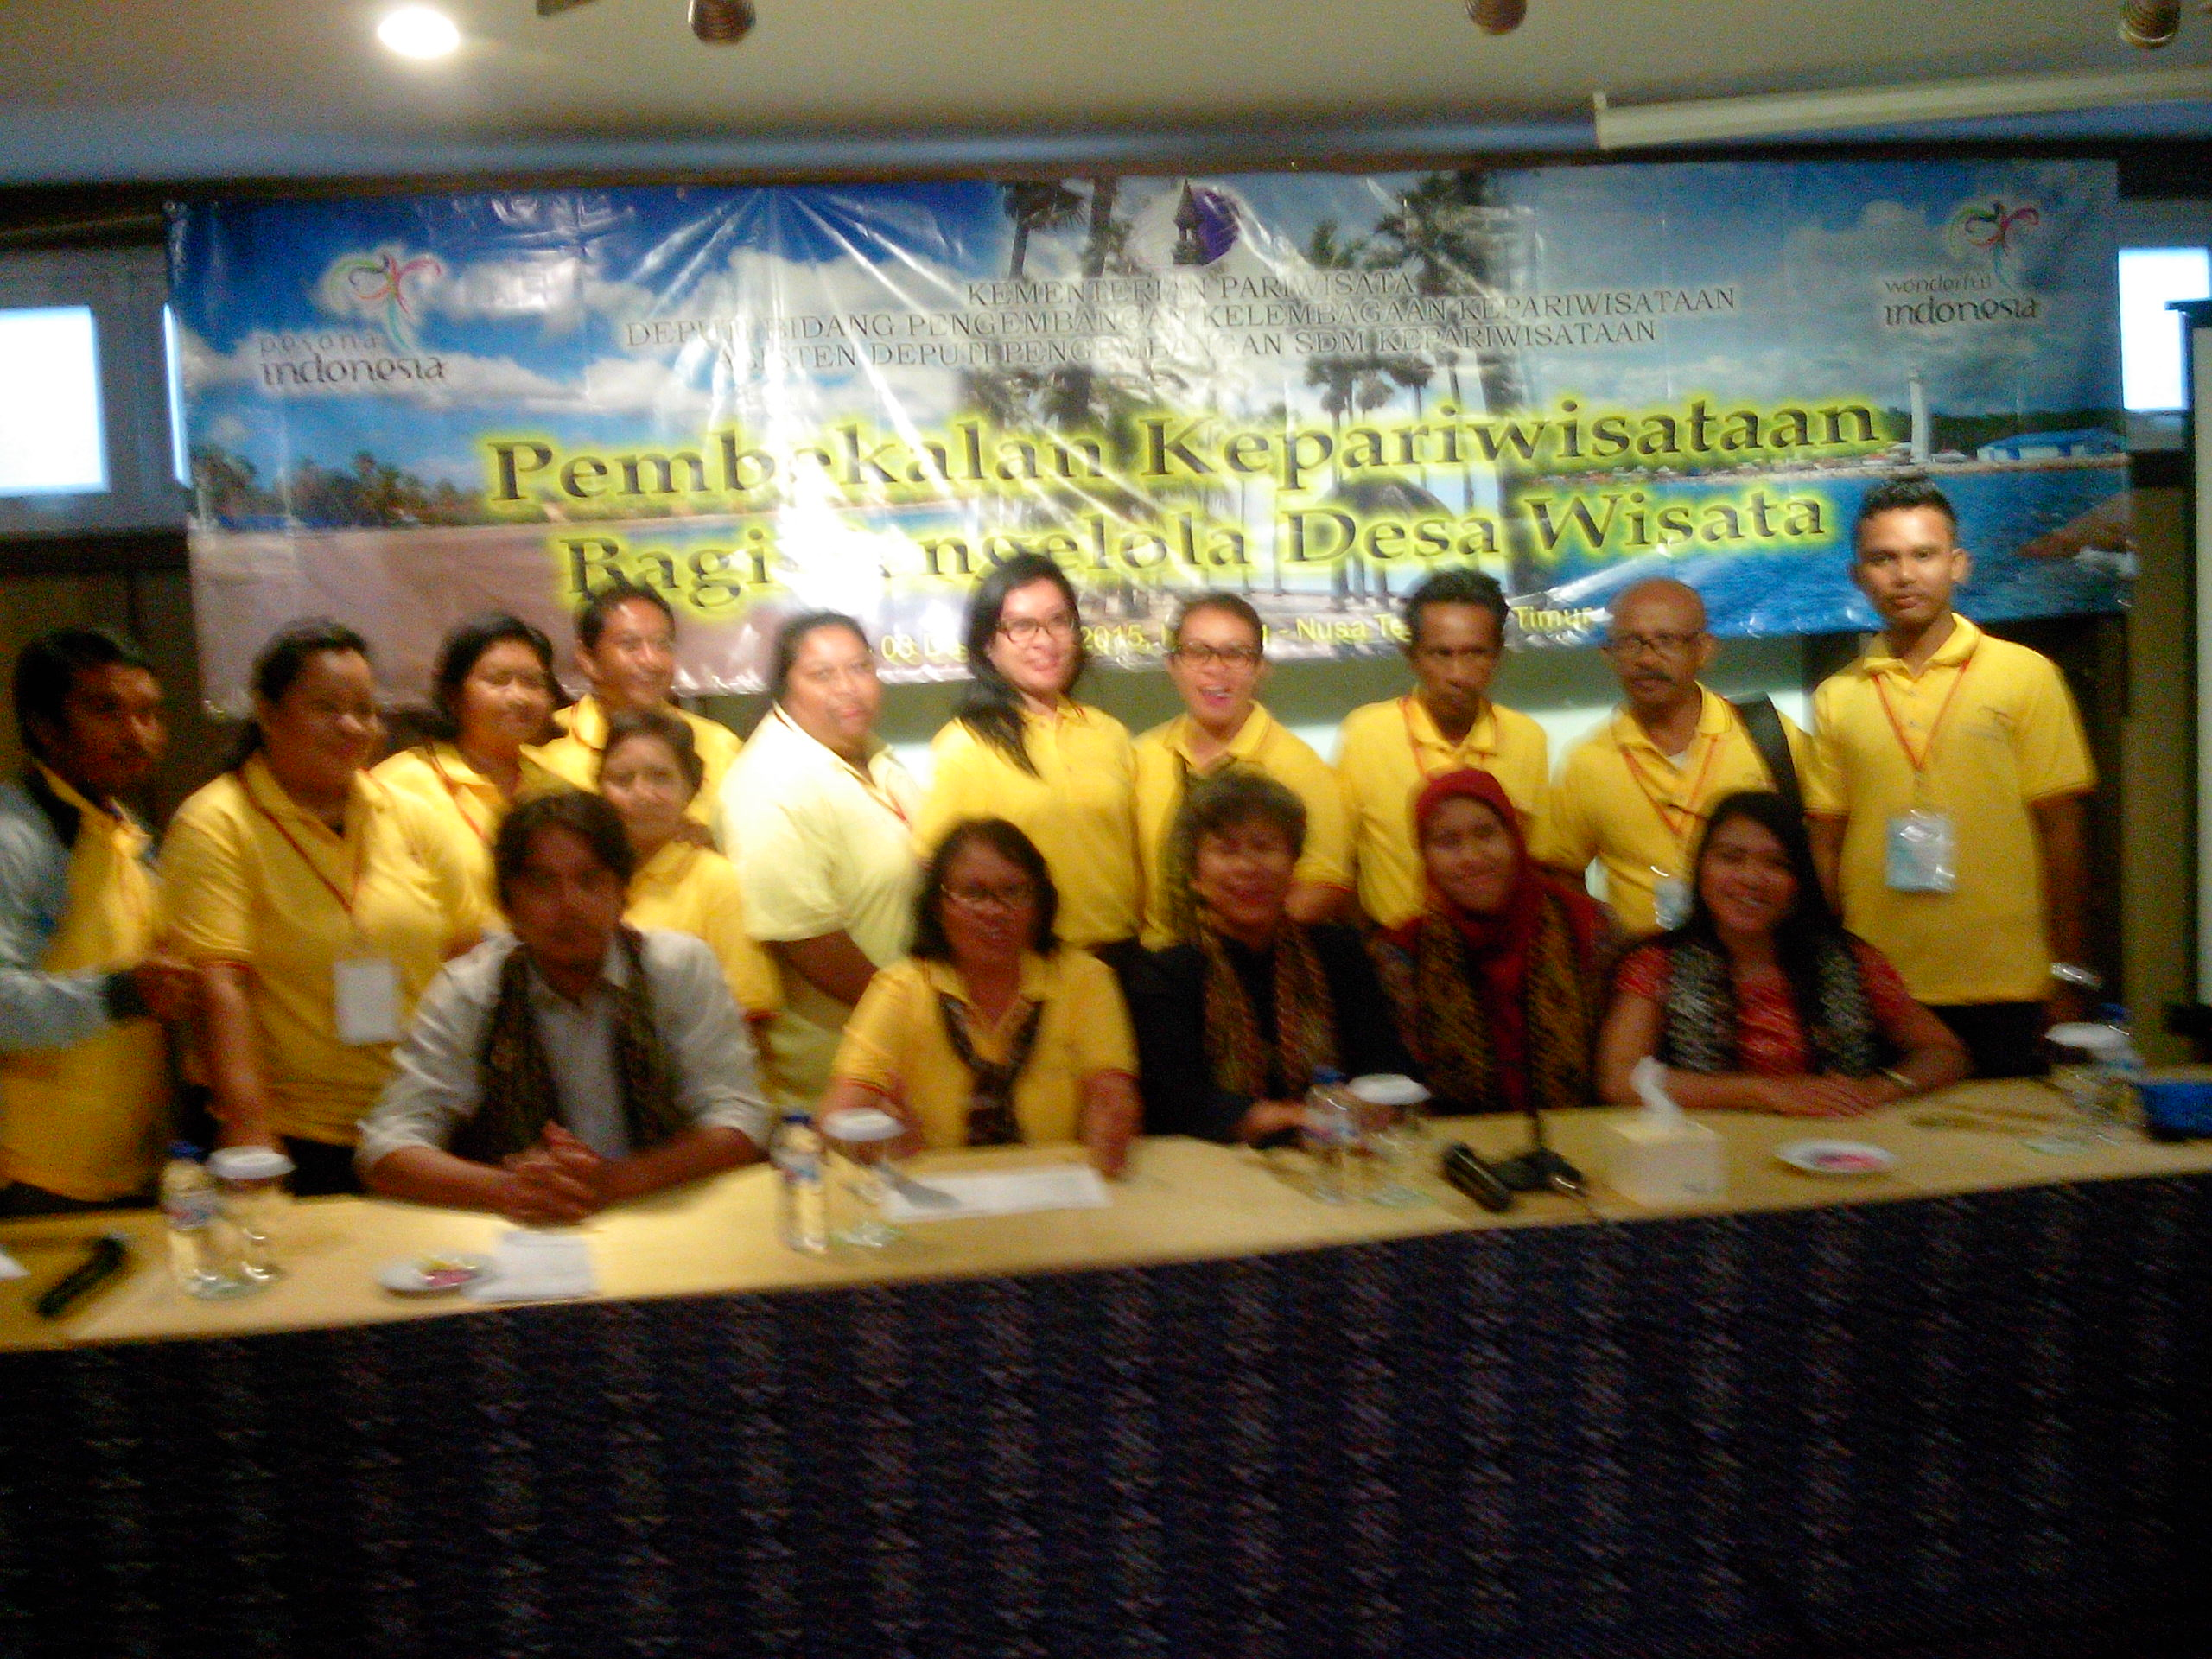 Kupang Coming Oleh Santi Diwyarthi Kompasiana Pura Oebananta Kab